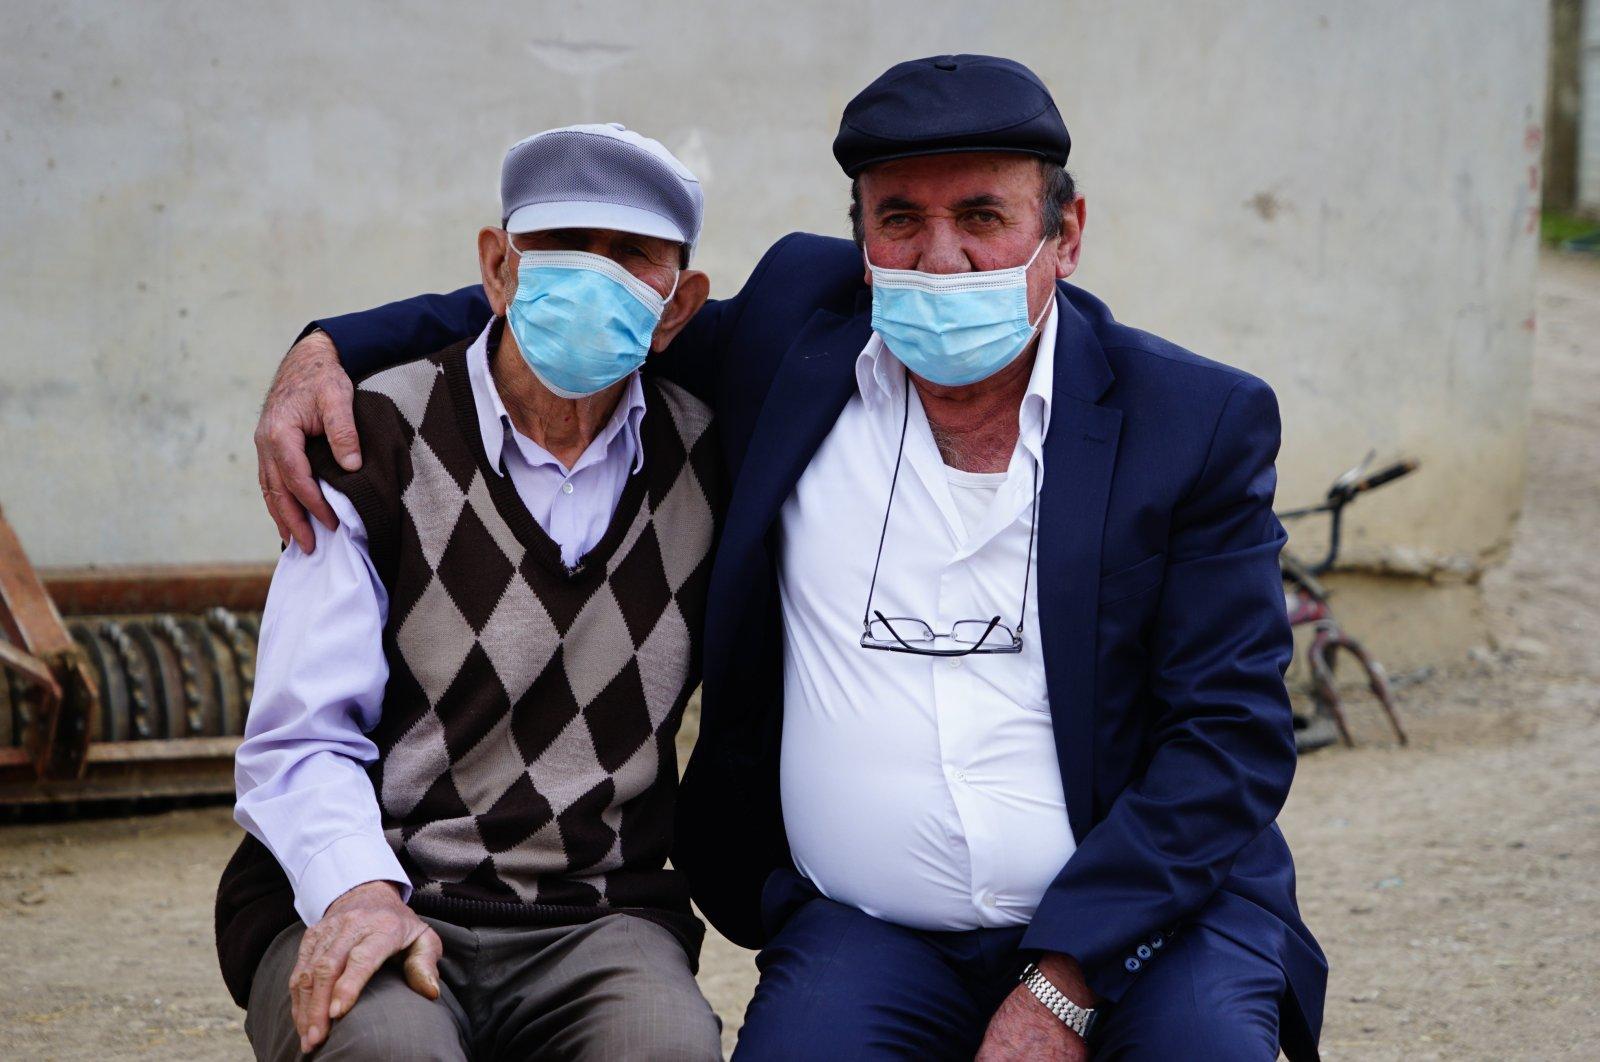 Hakkı Öksüzoğlu (L) and Muammer Terzioğlu pose together in Kastamonu, a city in northwestern Turkey, April 30, 2021. (IHA Photo)